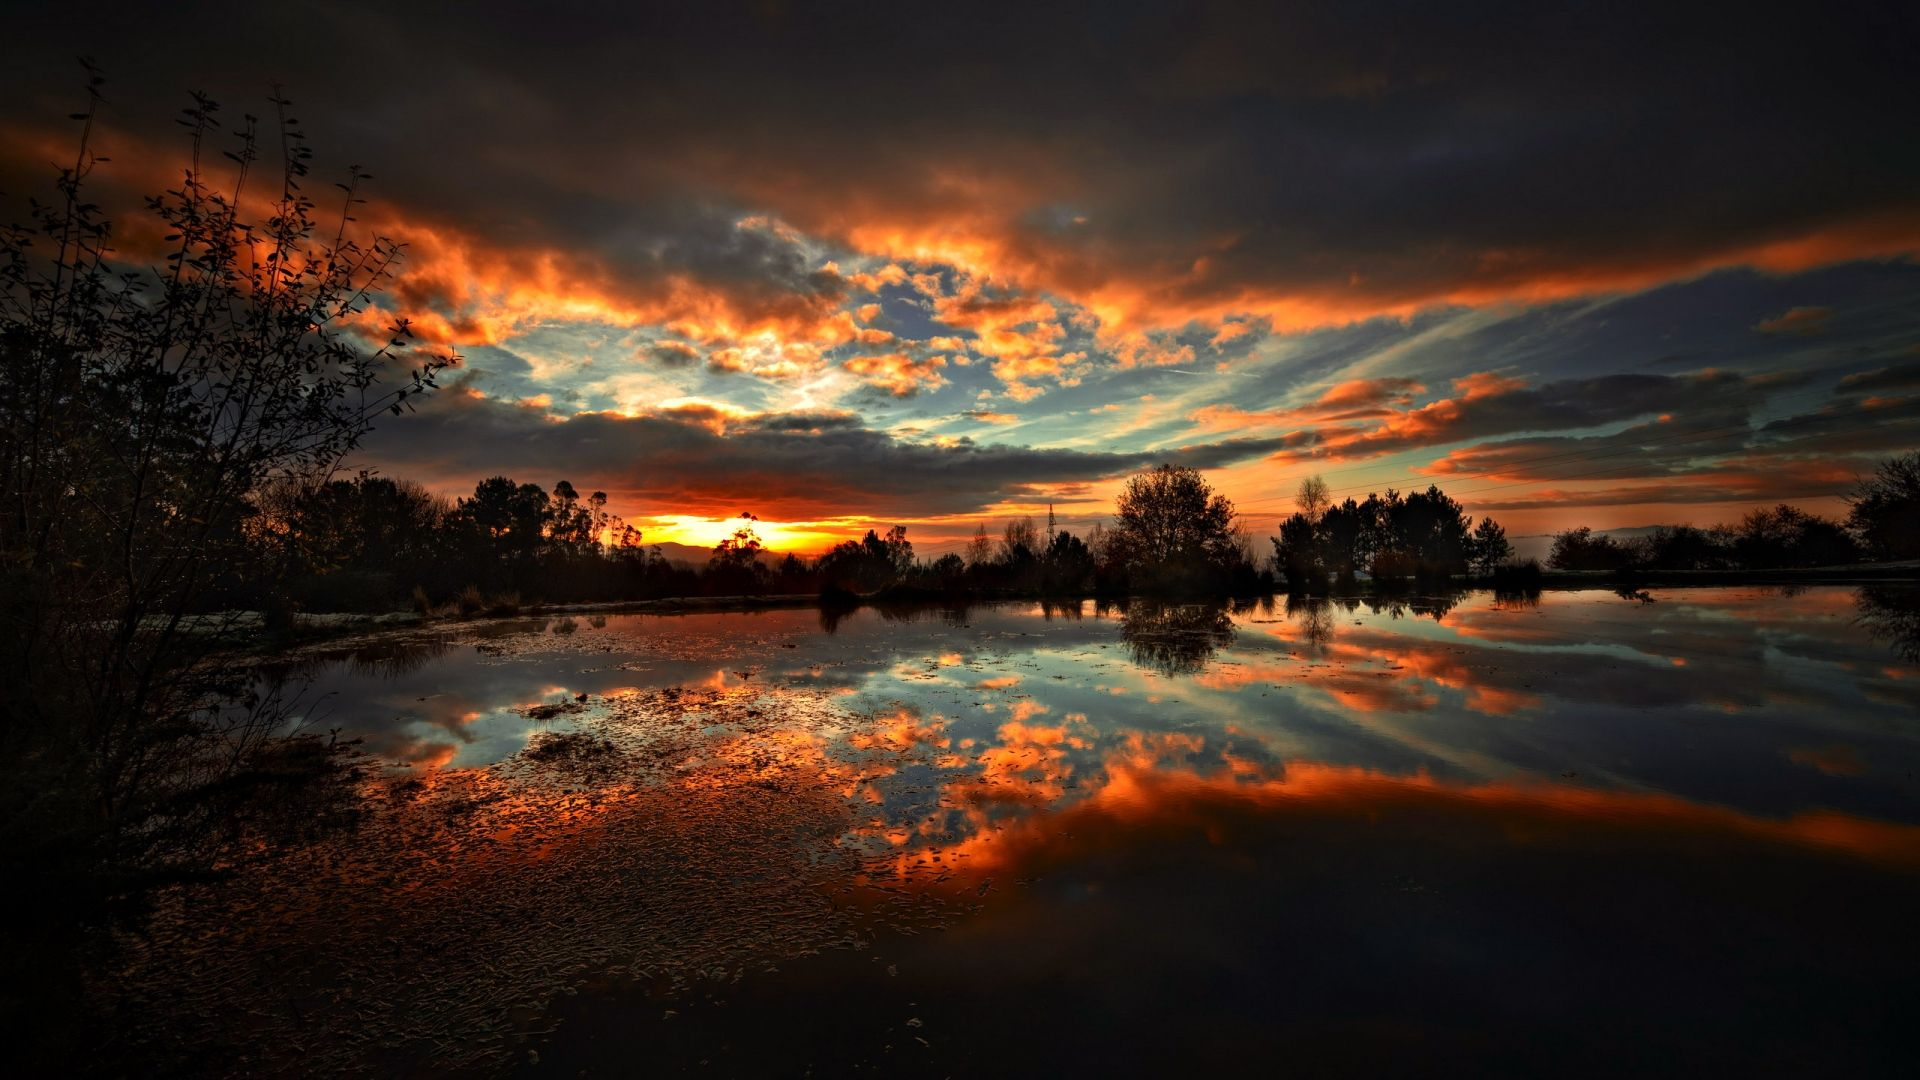 26 Sunset Hd Wallpaper 1080p On Wallpapersafari